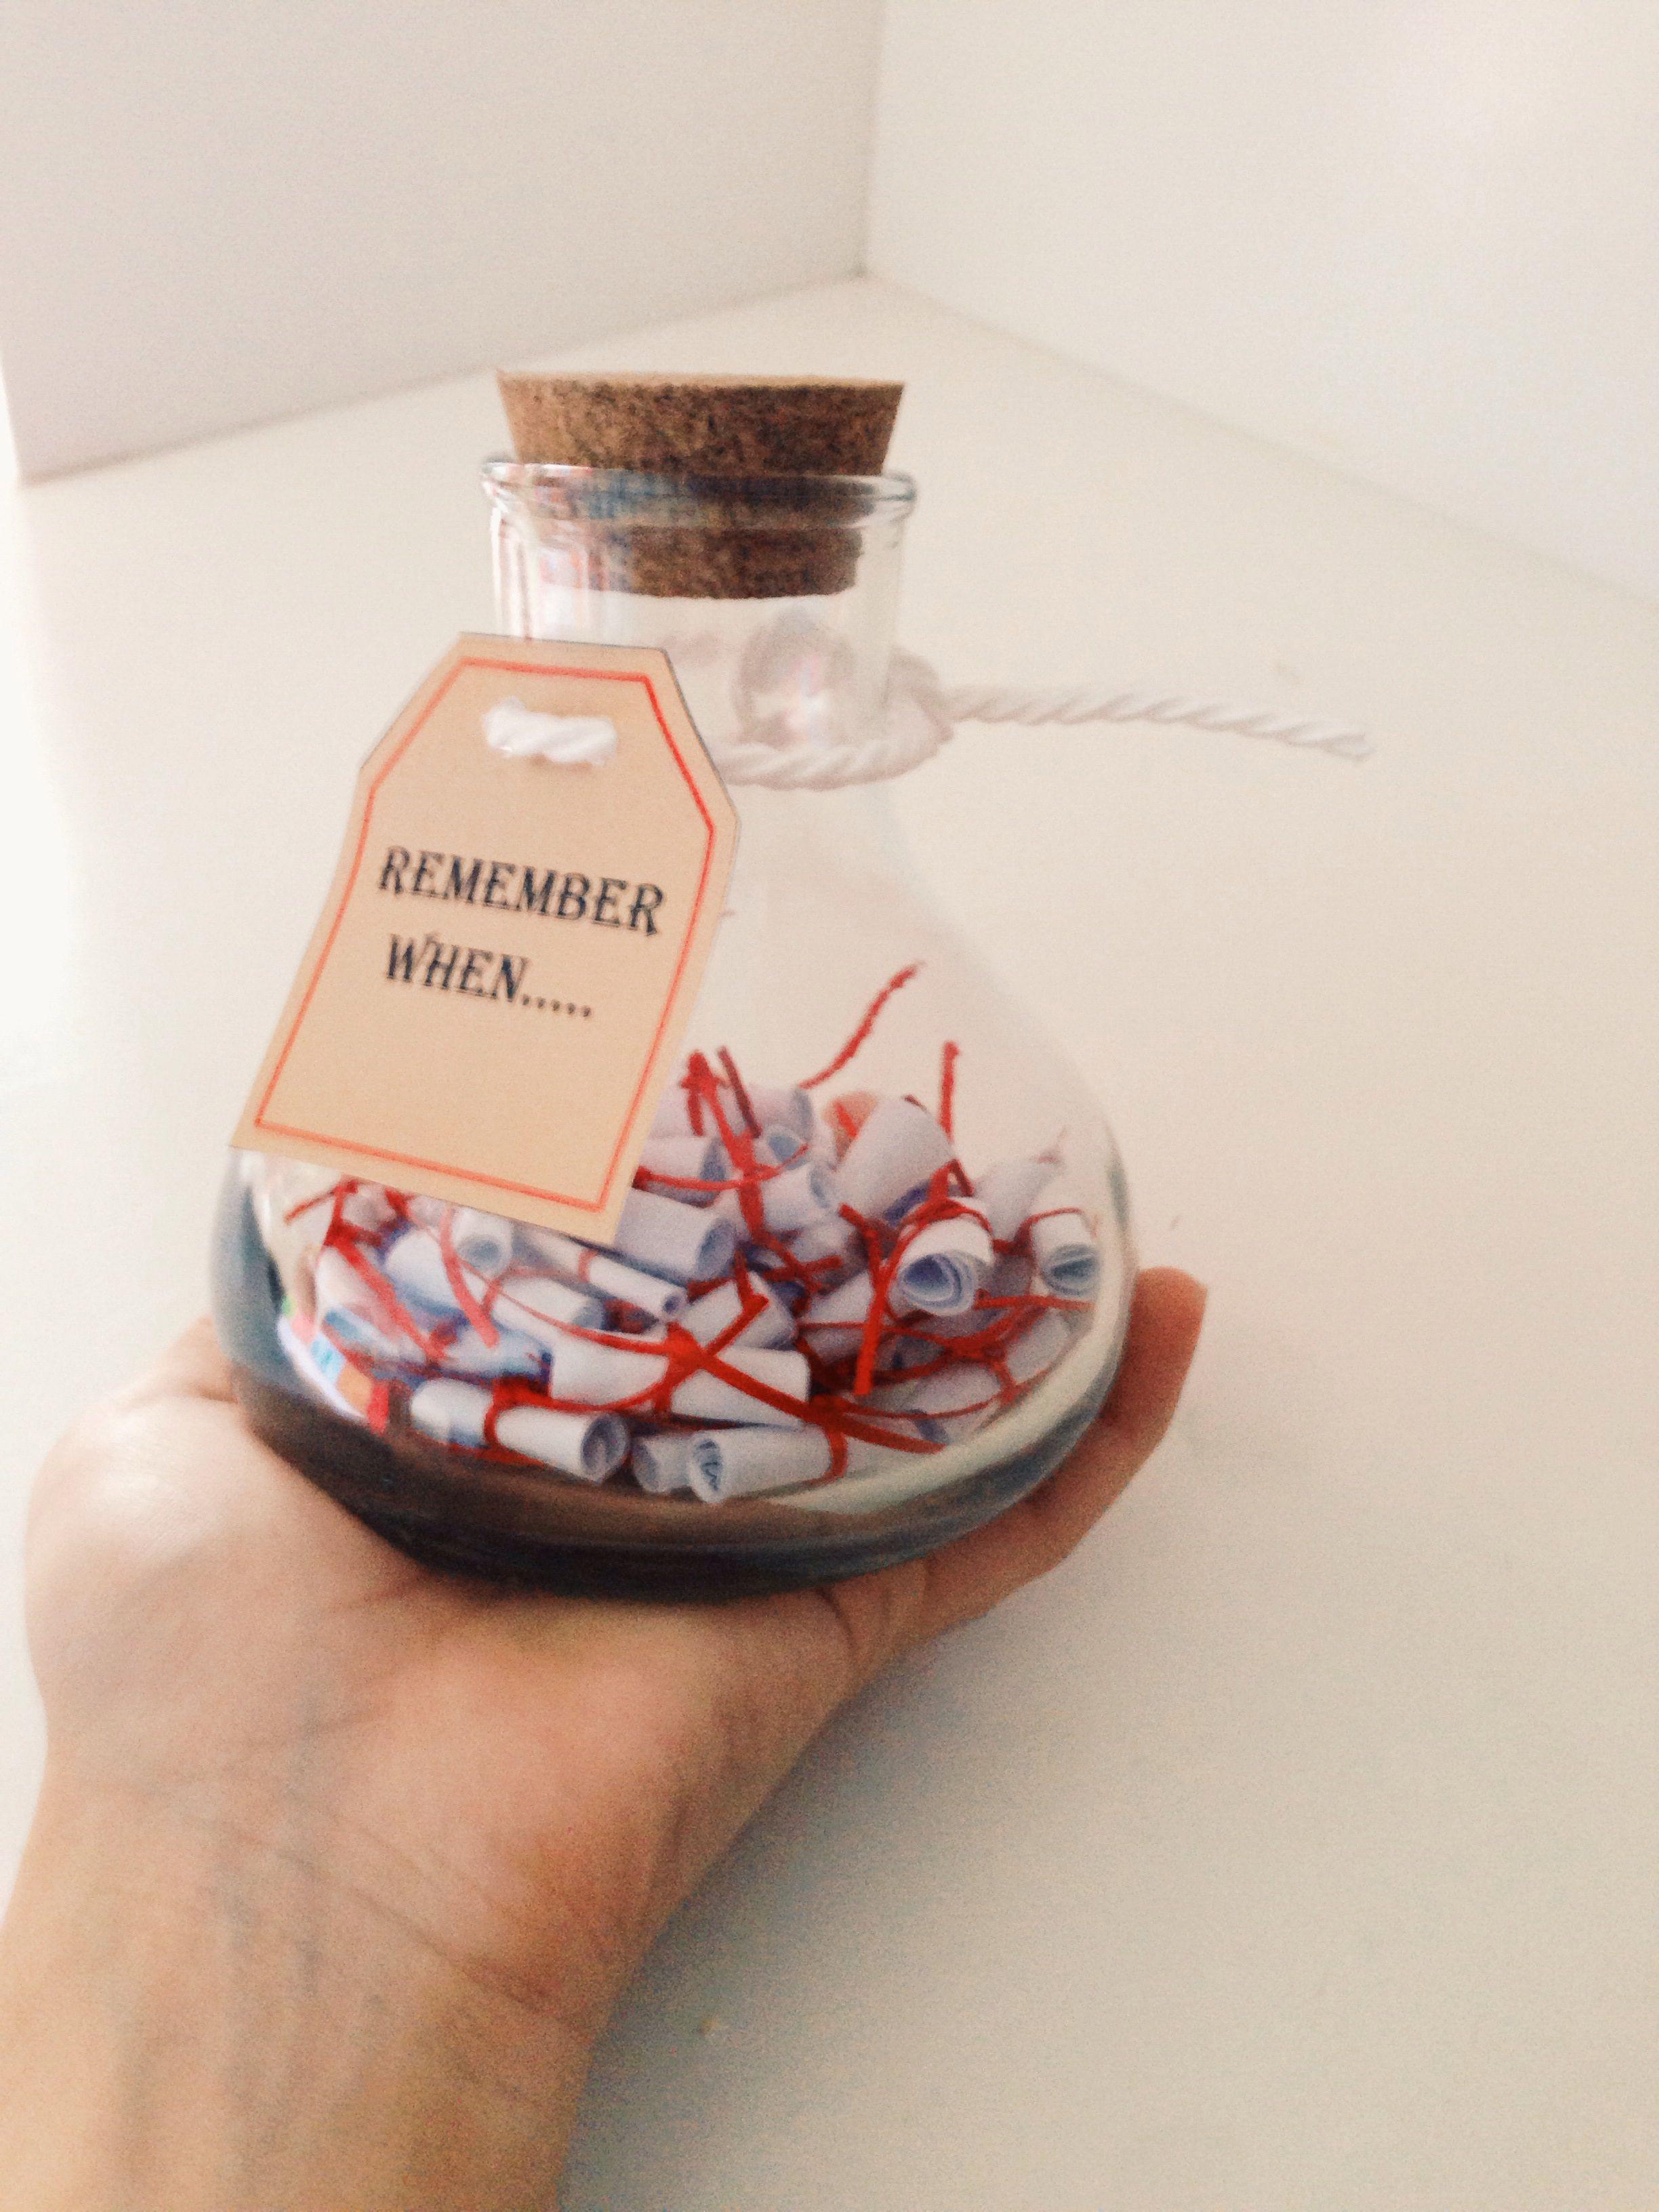 10 Fabulous Cute Creative Gift Ideas For Boyfriend 20 impressive valentines day gift ideas for him food ideas diy 2020